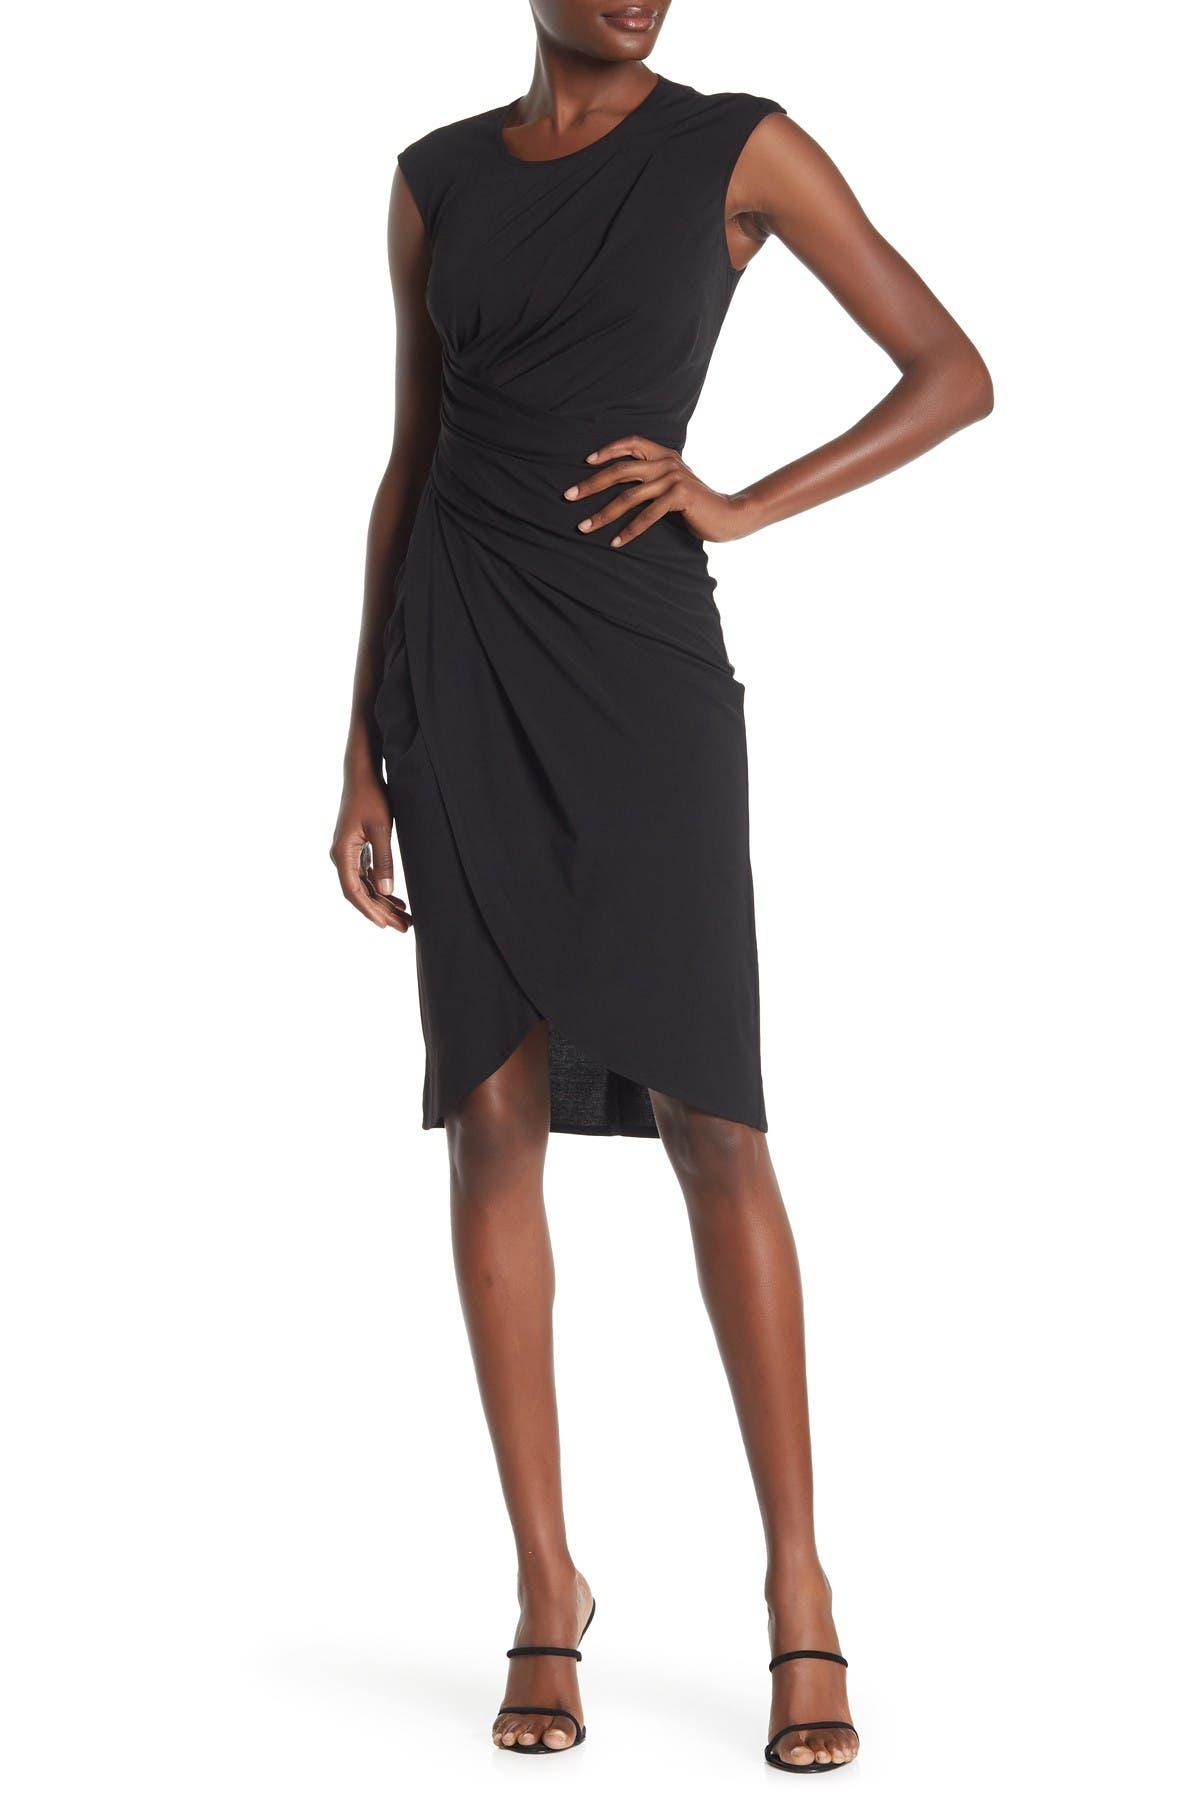 Image of NANETTE nanette lepore Gathered Shift Dress